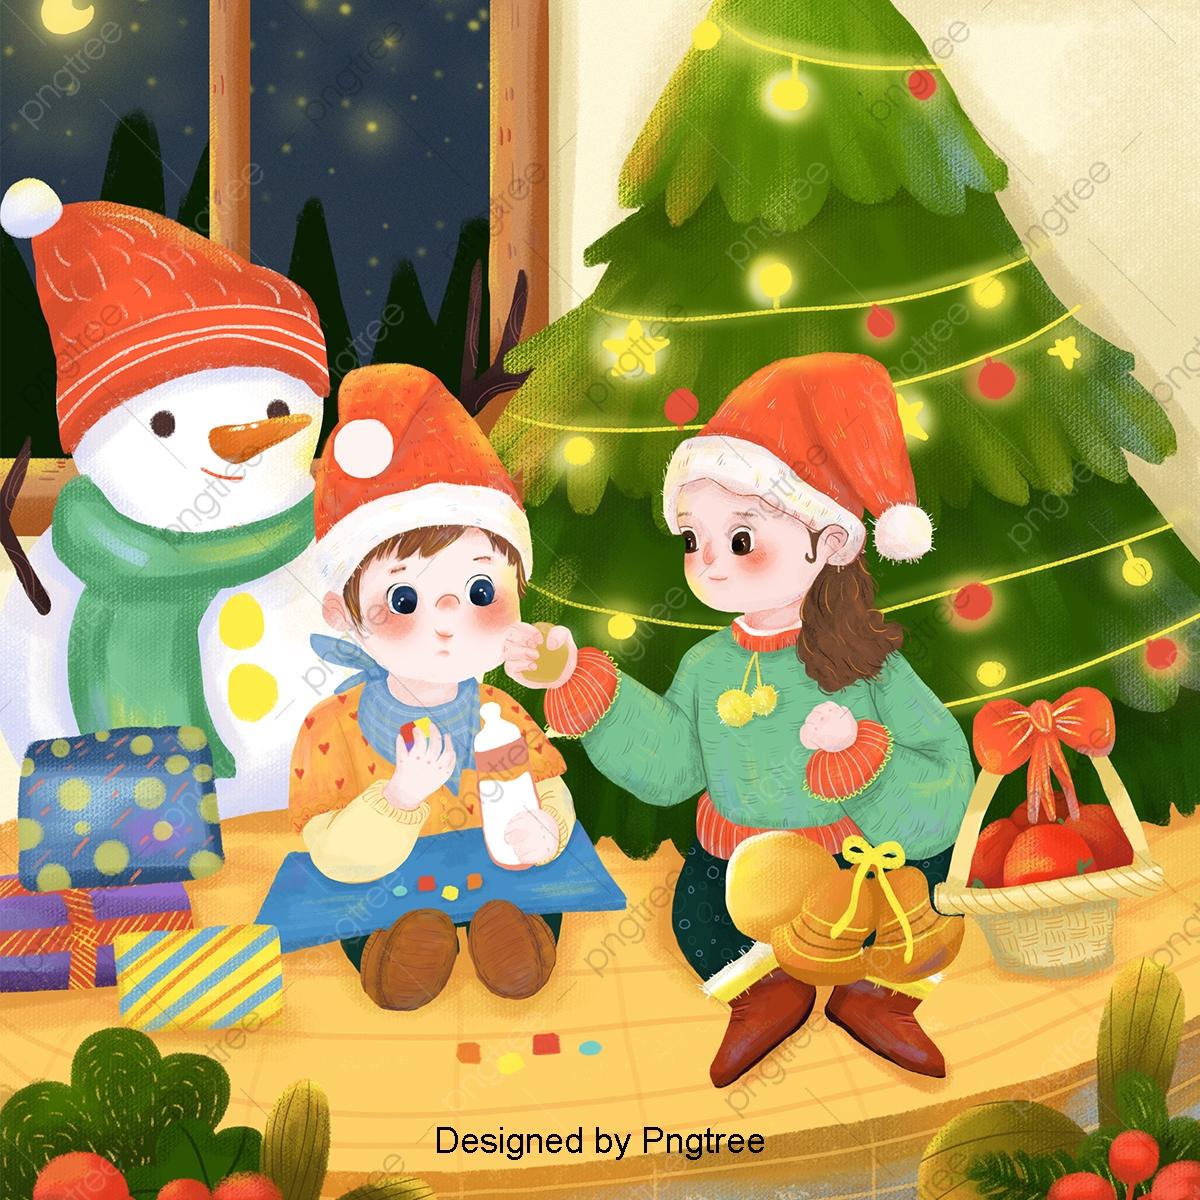 Christmas Celebration Cartoon Images.Christmas Celebration And Festival Cartoon Xie And